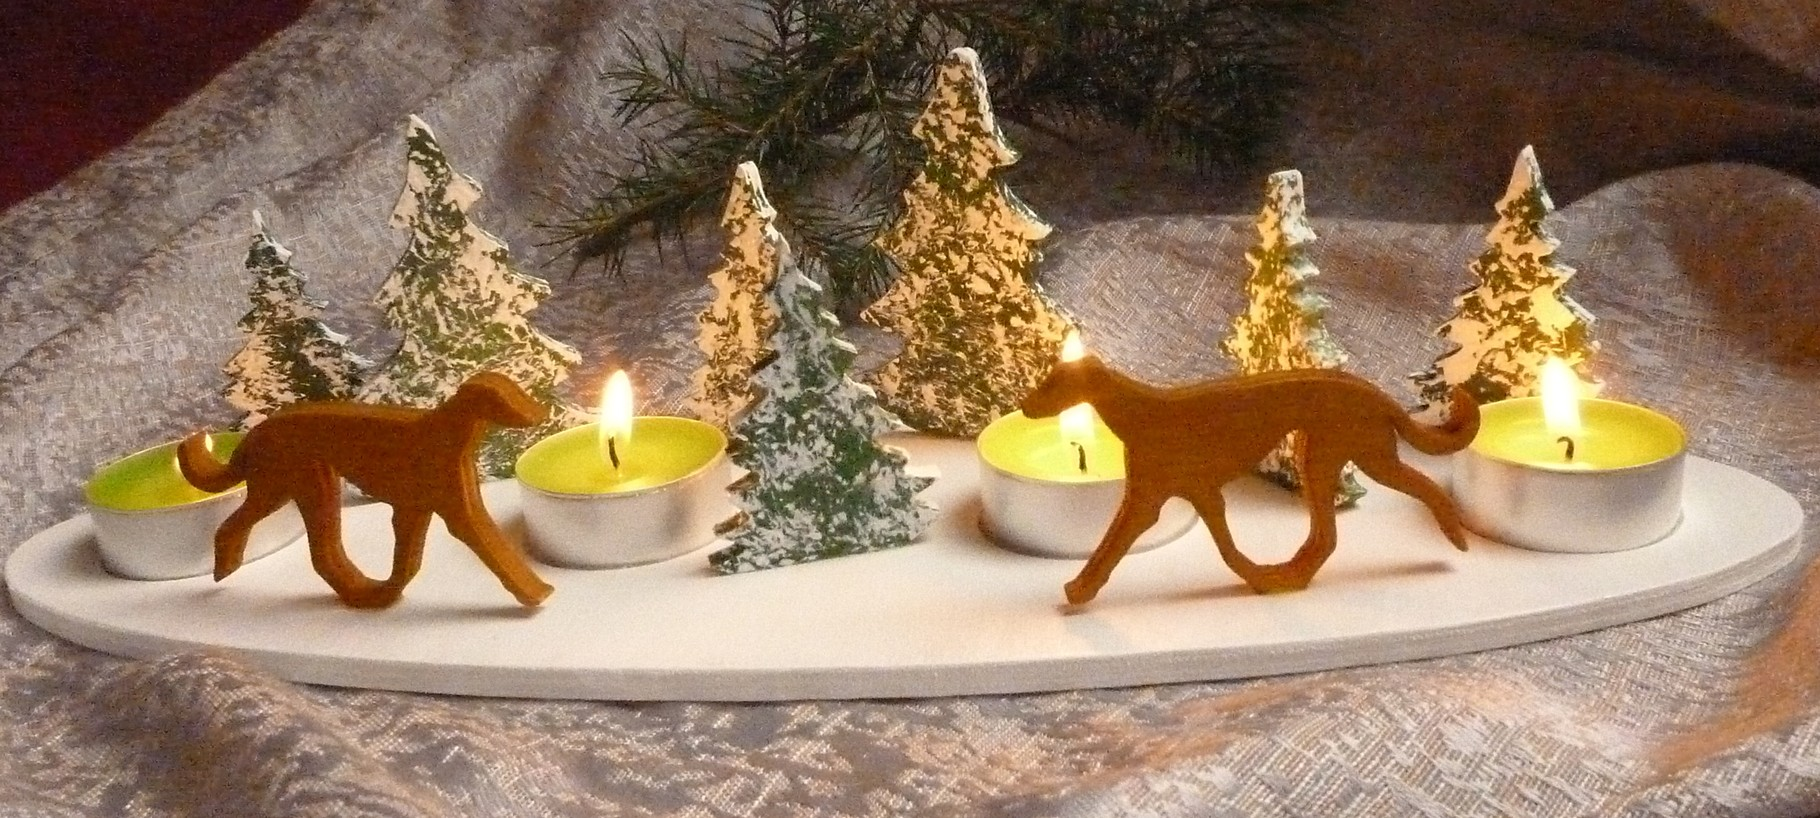 Teelichthalter Advent oval Galgo Espanol